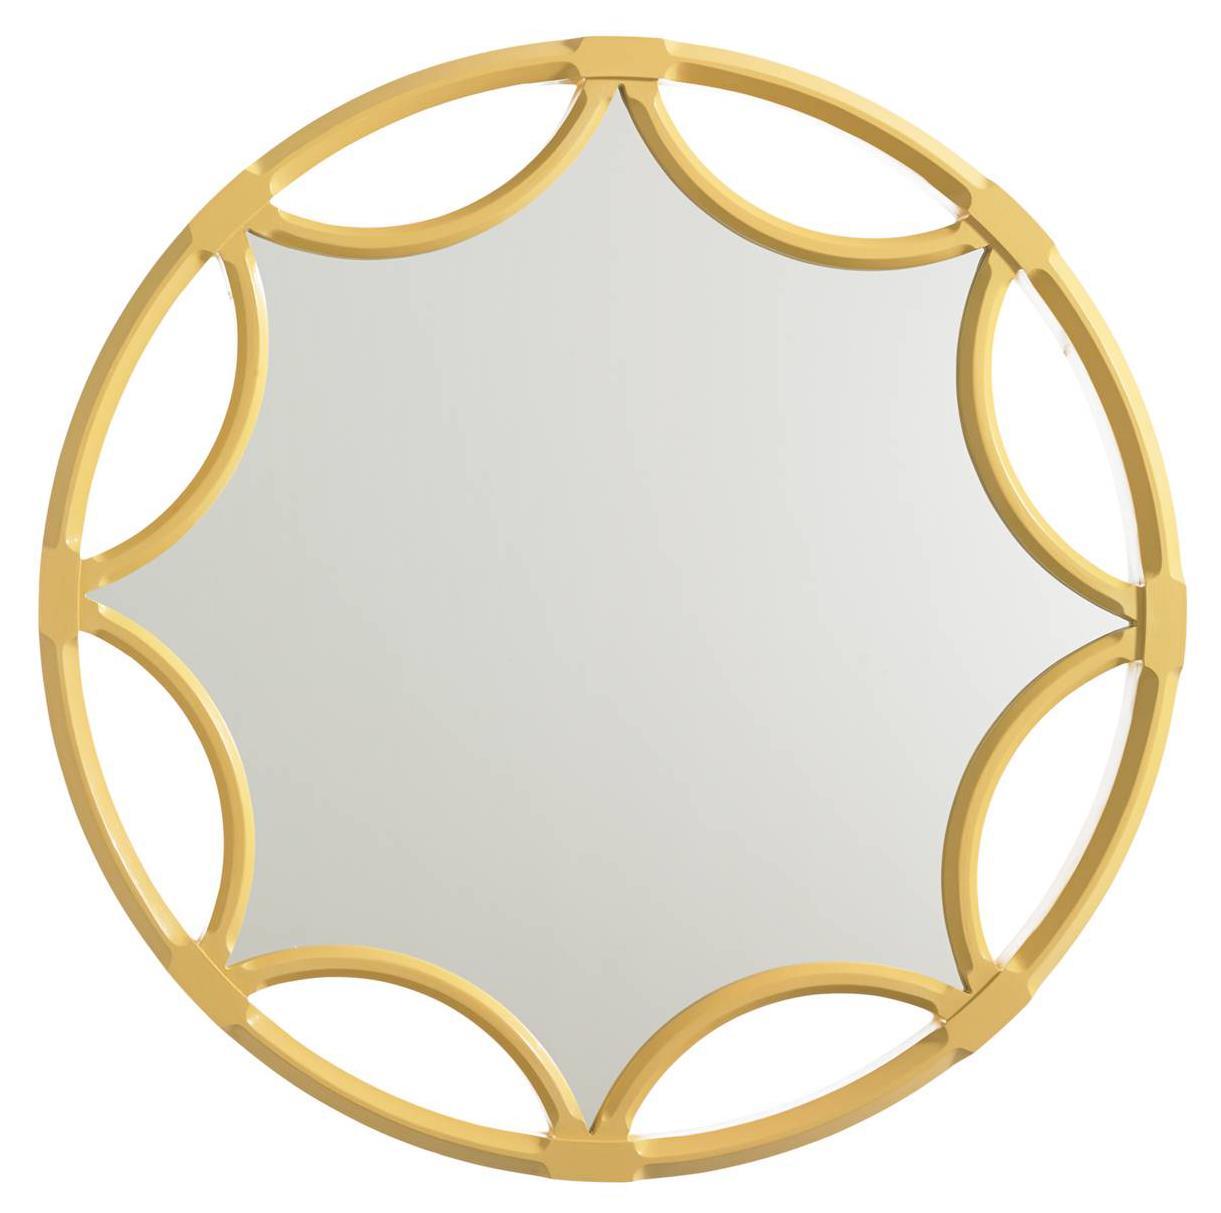 Stanley Furniture Crestaire Amado Mirror - Item Number: 436-73-33